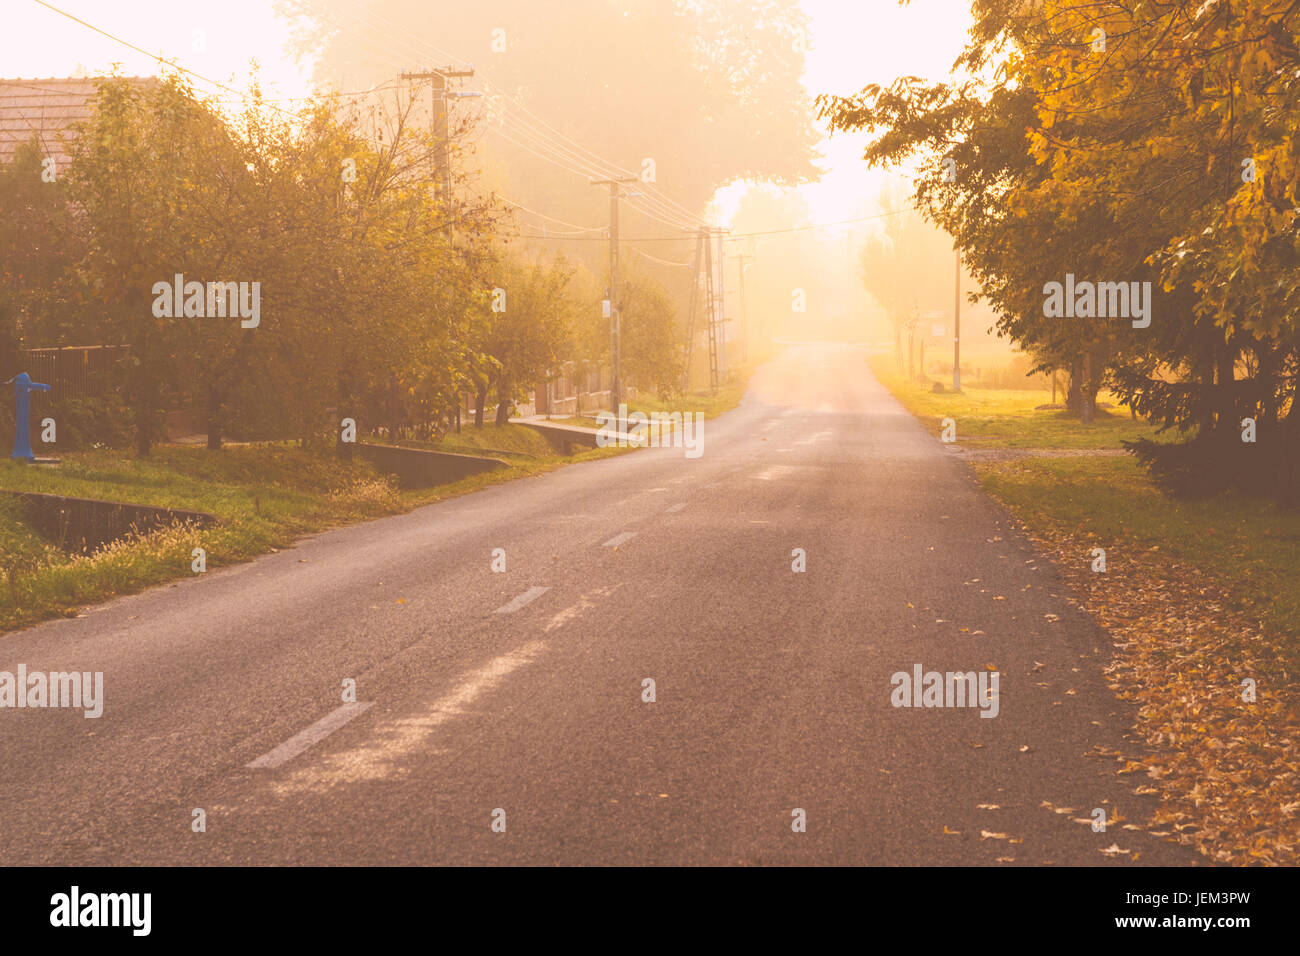 Foggy road - Stock Image